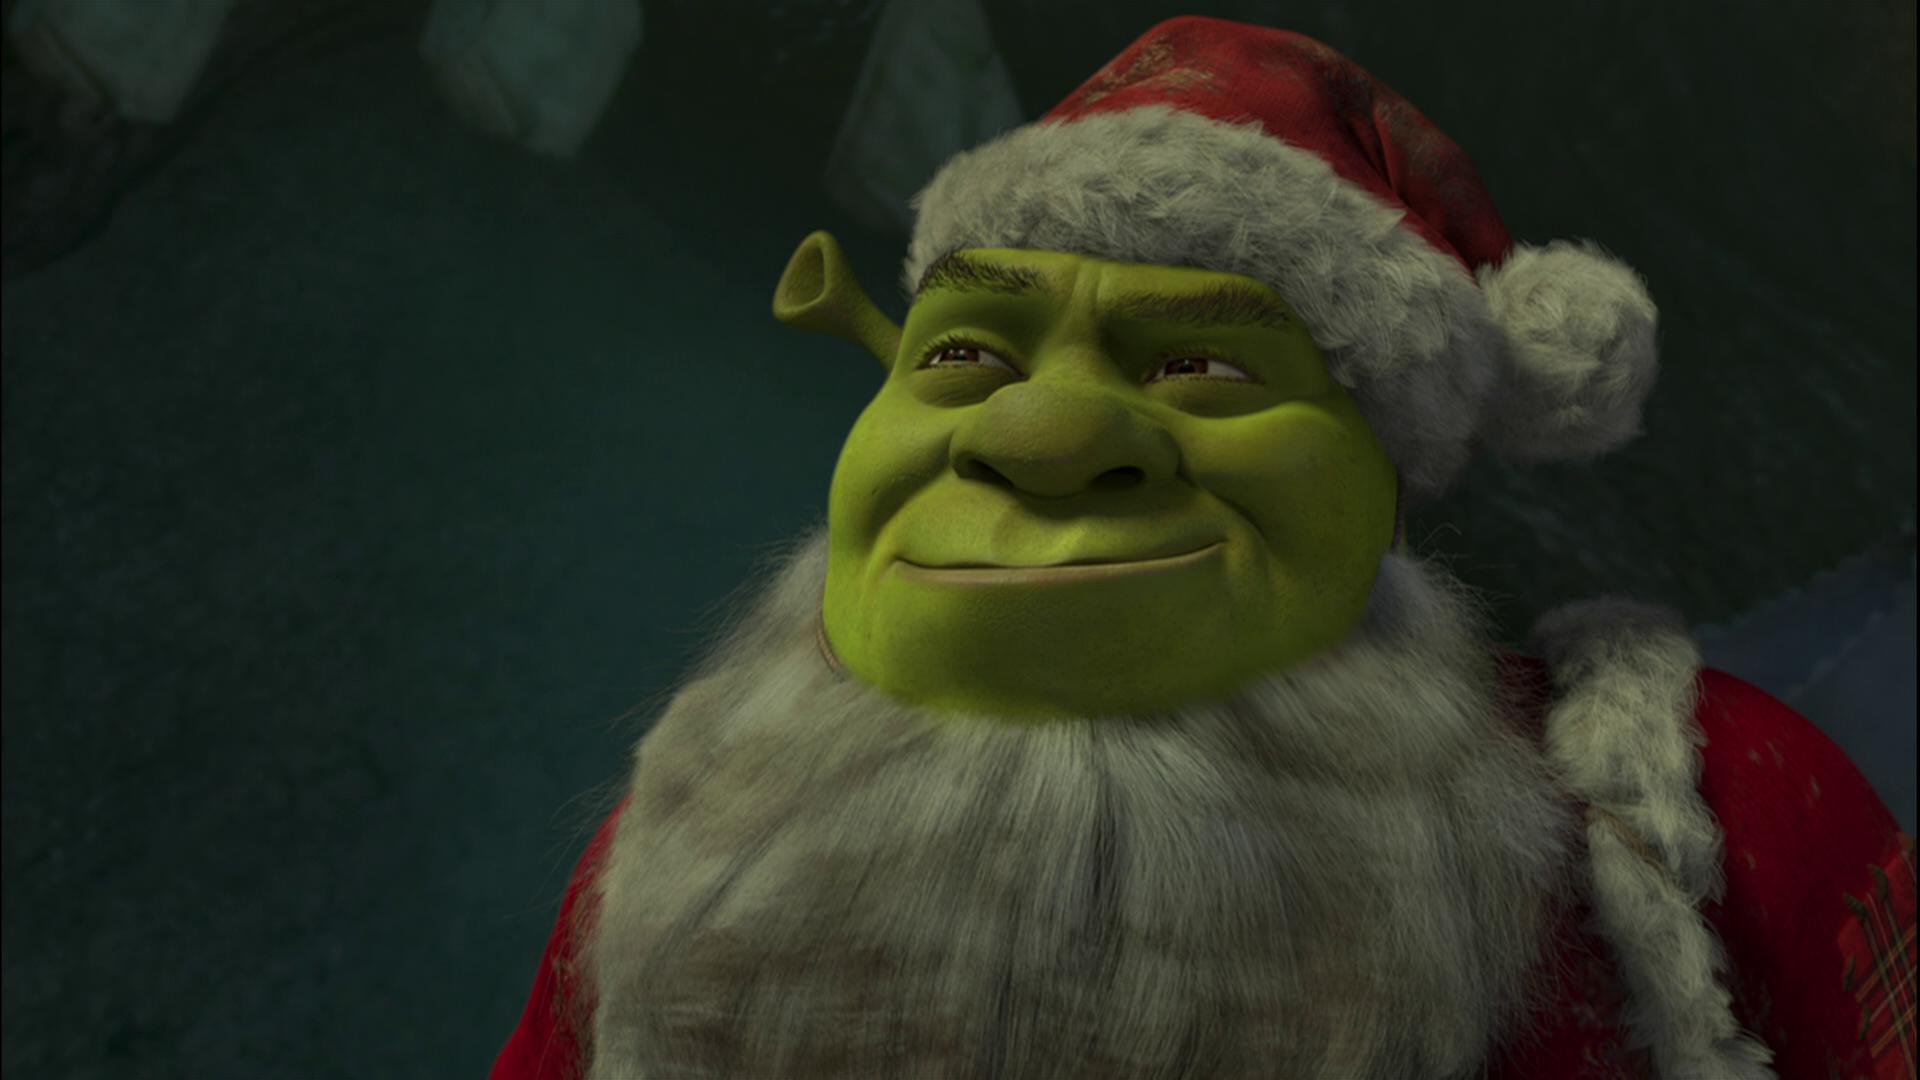 Shrek english coursework